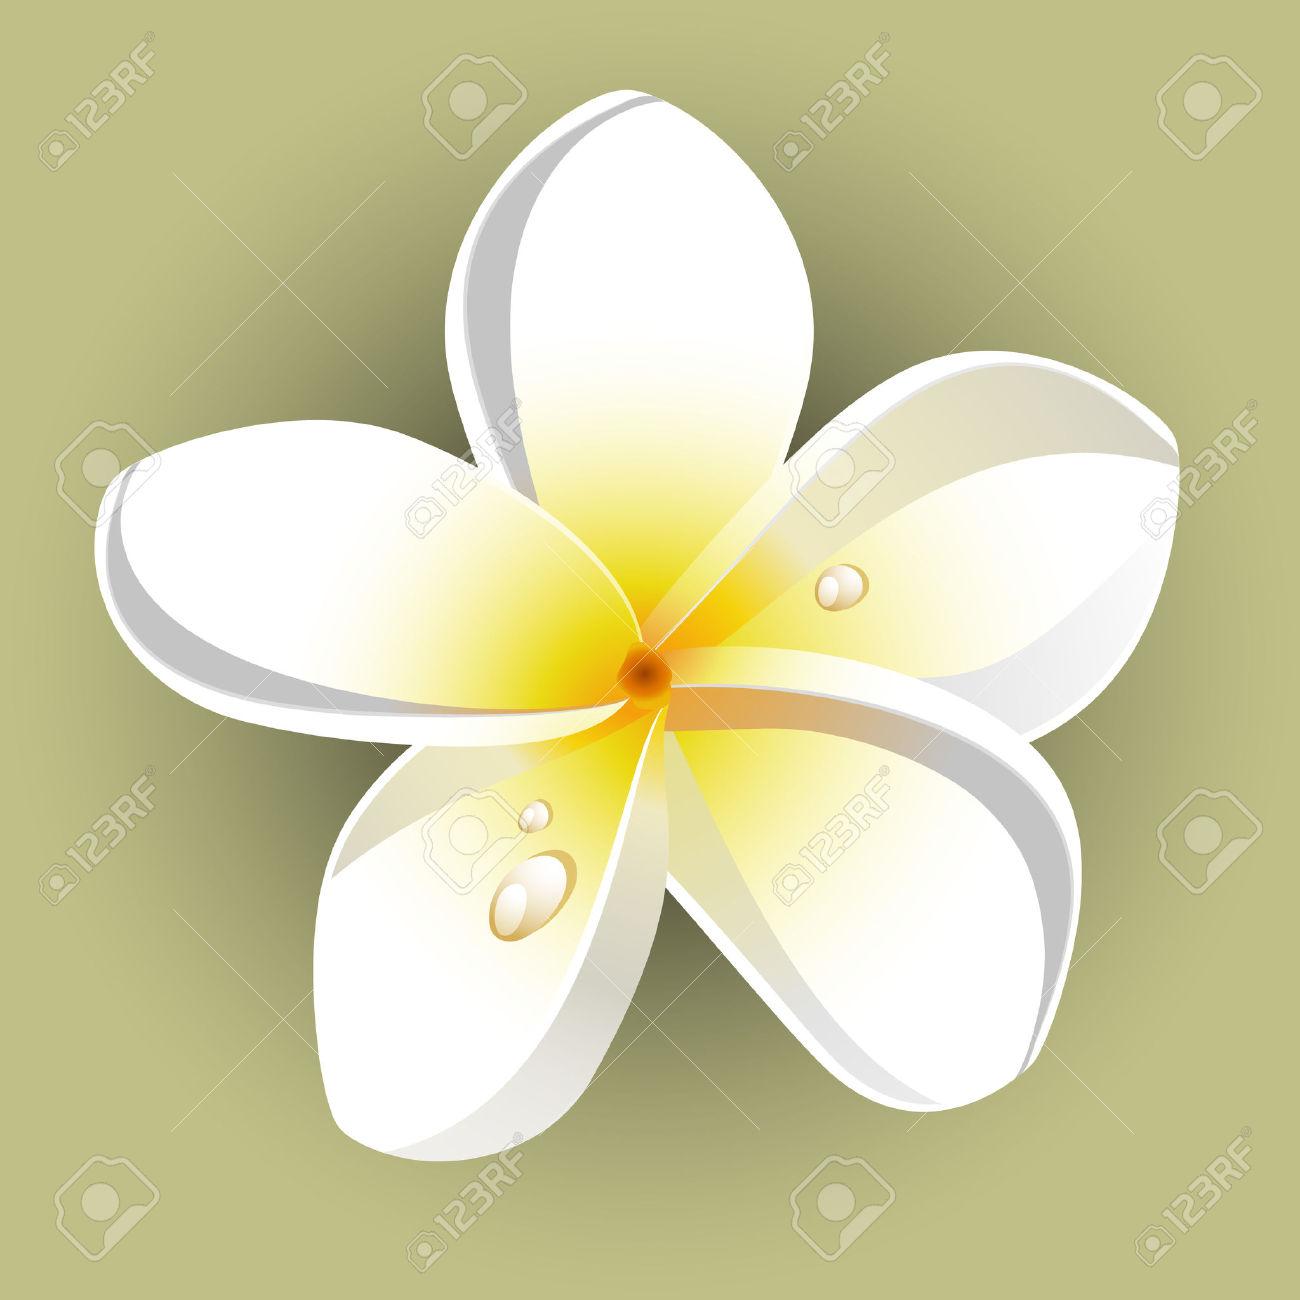 White Plumeria (Frangipani). Isolated. Royalty Free Cliparts.